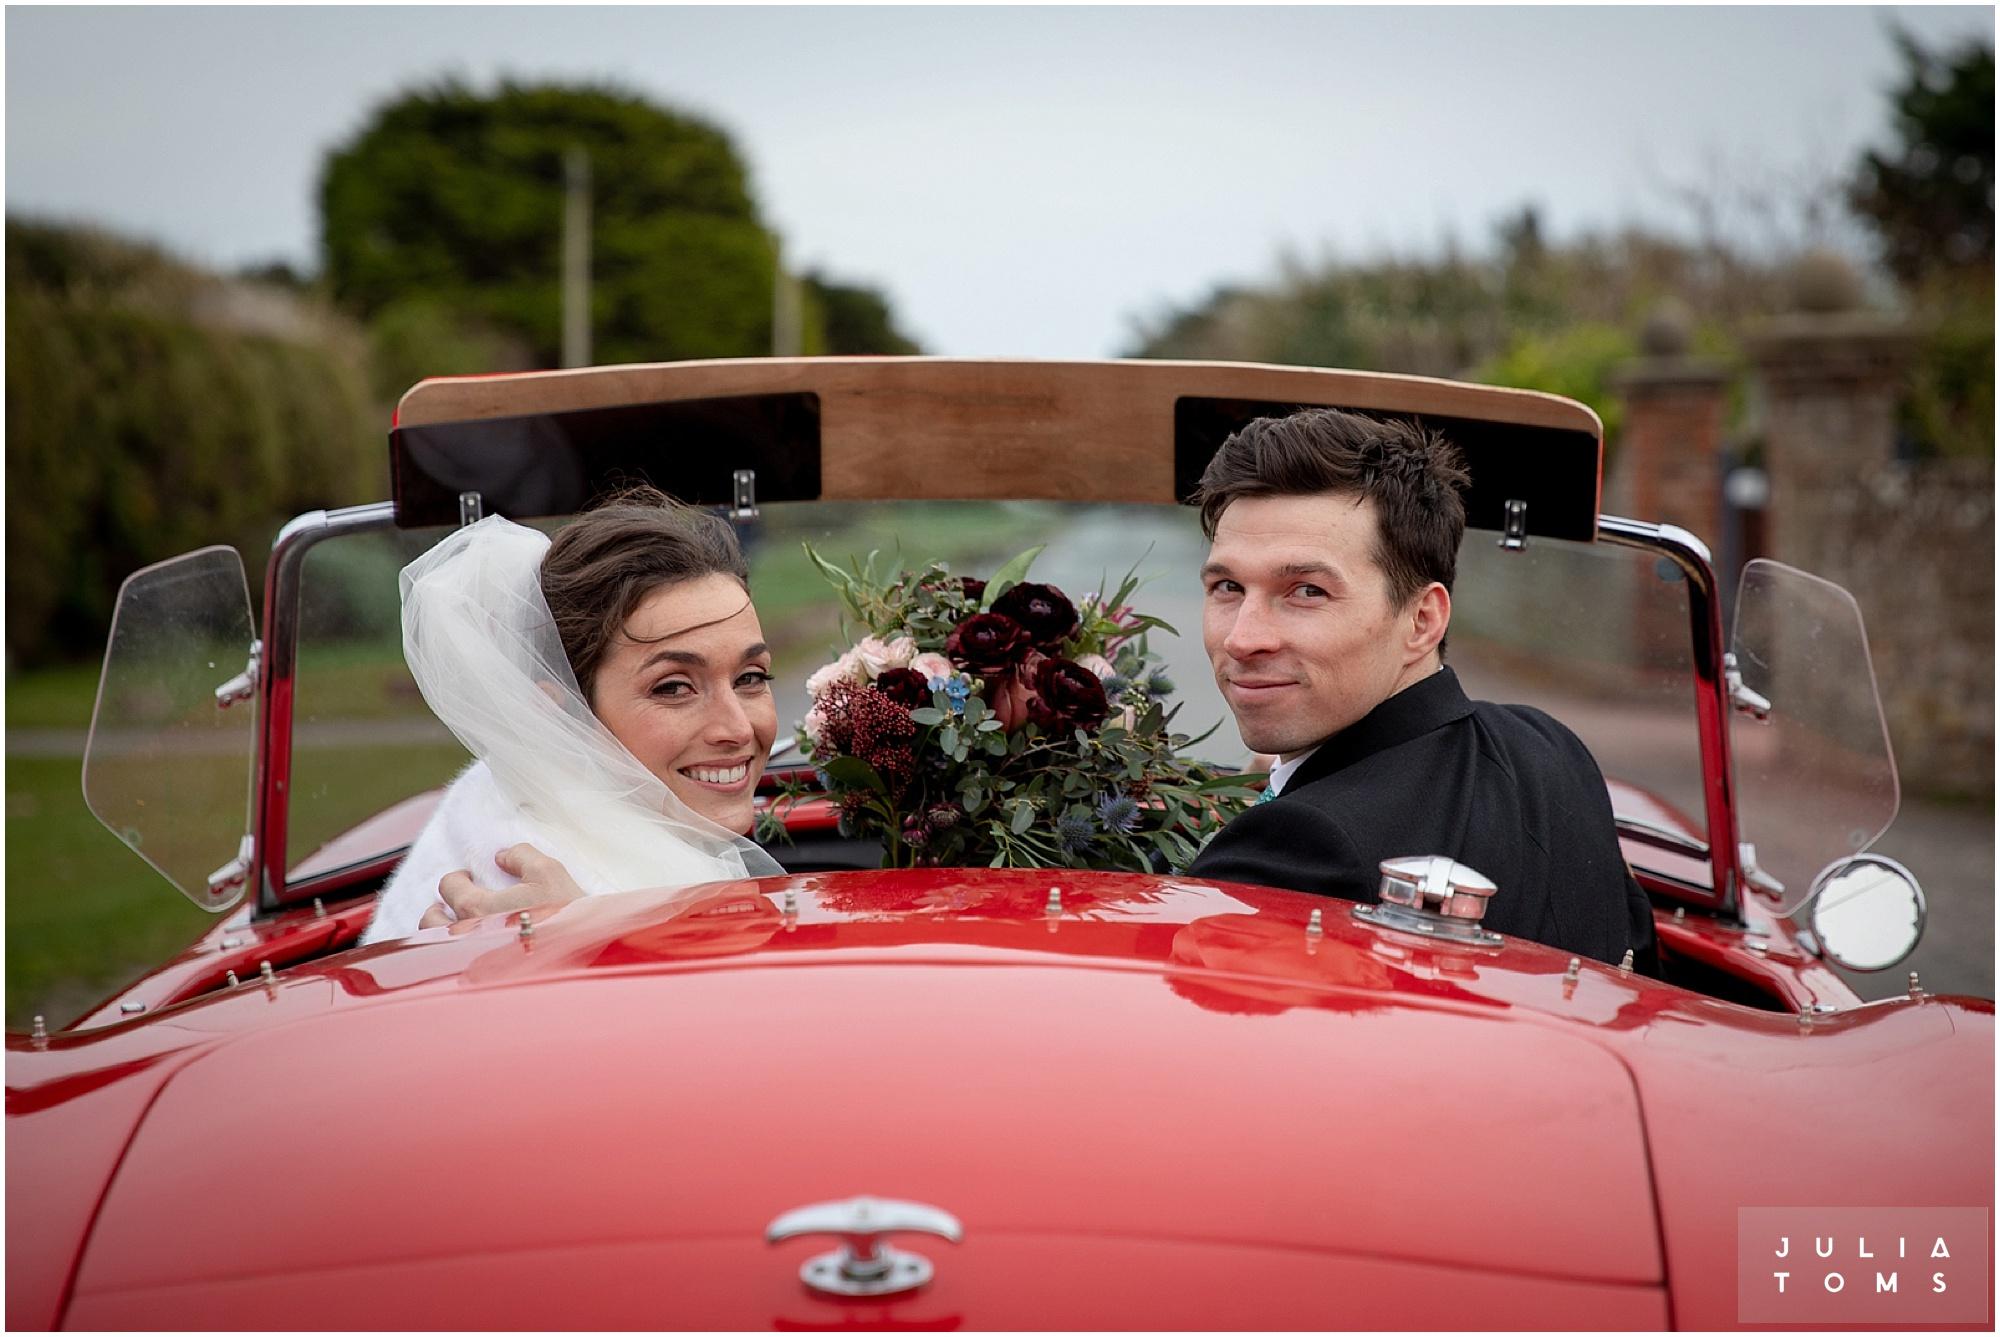 Southend_barn_wedding_photographer_juliatoms_012.jpg